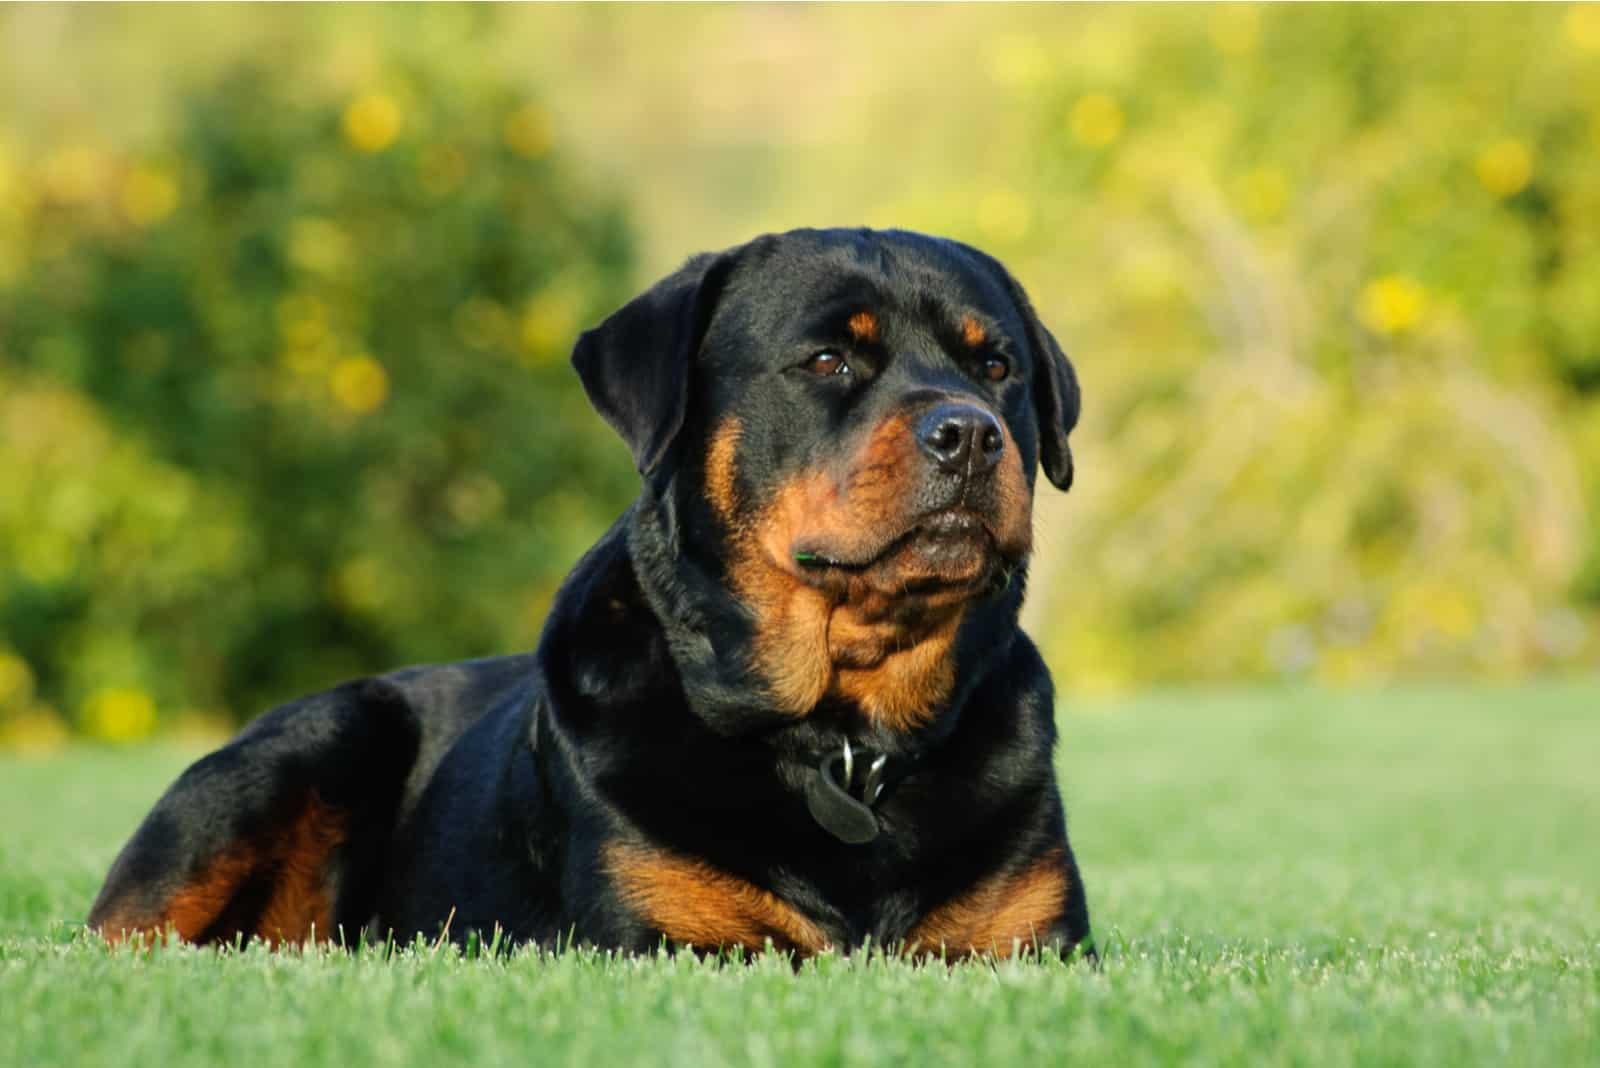 Rottweiler-Hundeporträt im Freien, das sich im grünen Gras hinlegt